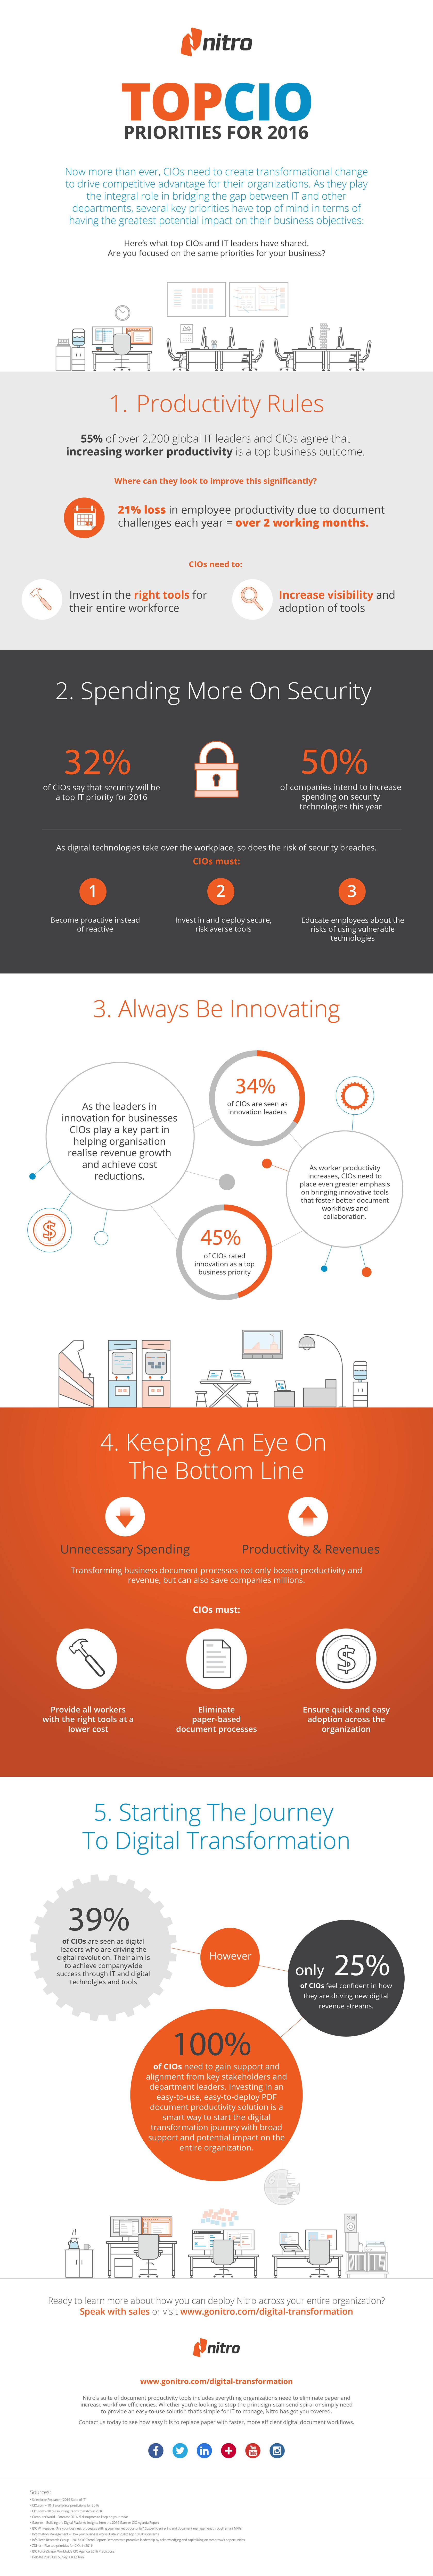 CIO-infographic.png